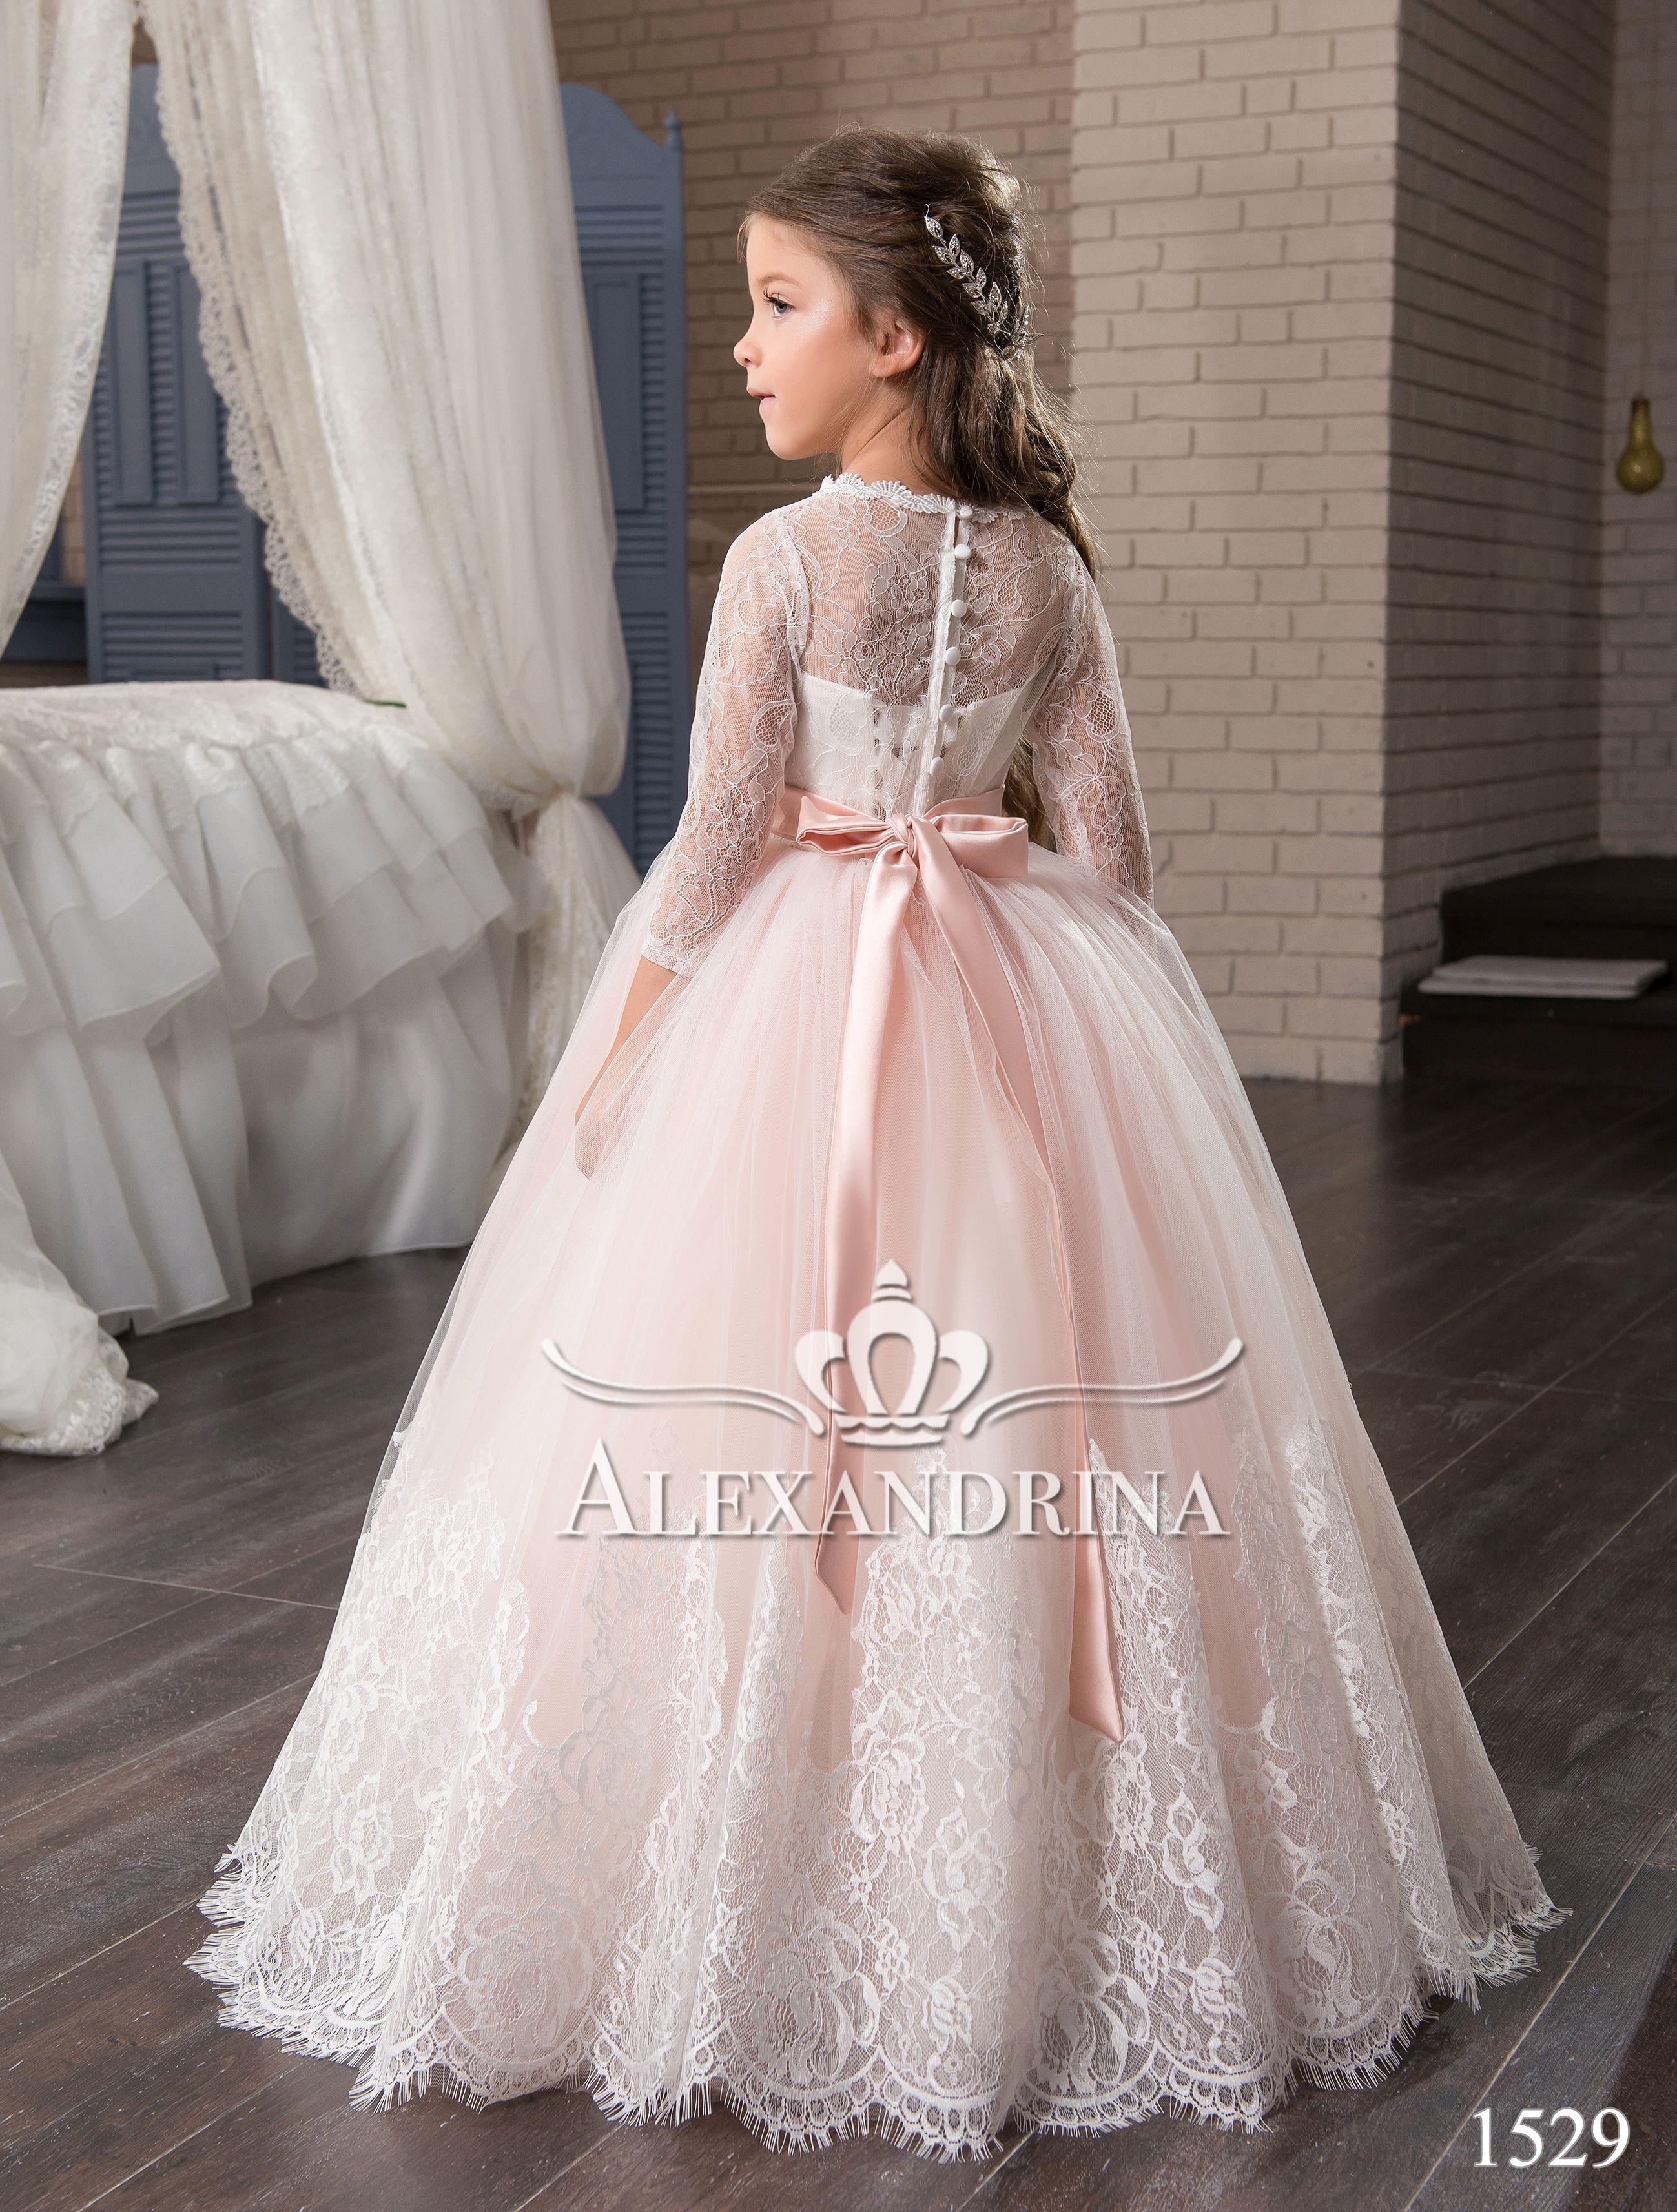 a96cec5b067  firstcommunion  flowergirldress  communiondress  firstcommuniondress   whitedress  dressforprincess  weddingdress